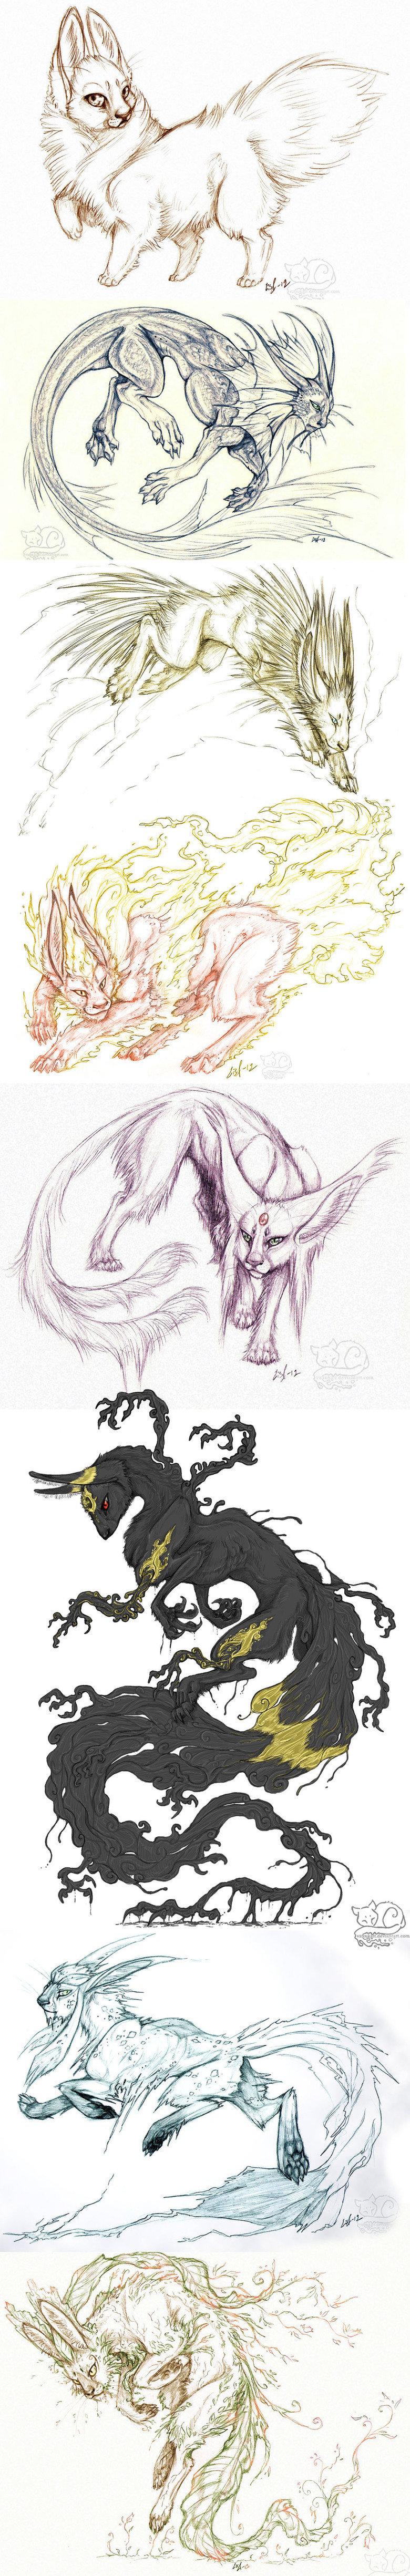 Alternate Eevee Art!. by Vattukatt on DevArt.. Most of these aare feline-like.... Ive always imagined evve-lutions to have a fox-ish quality to them. Eeveelutions